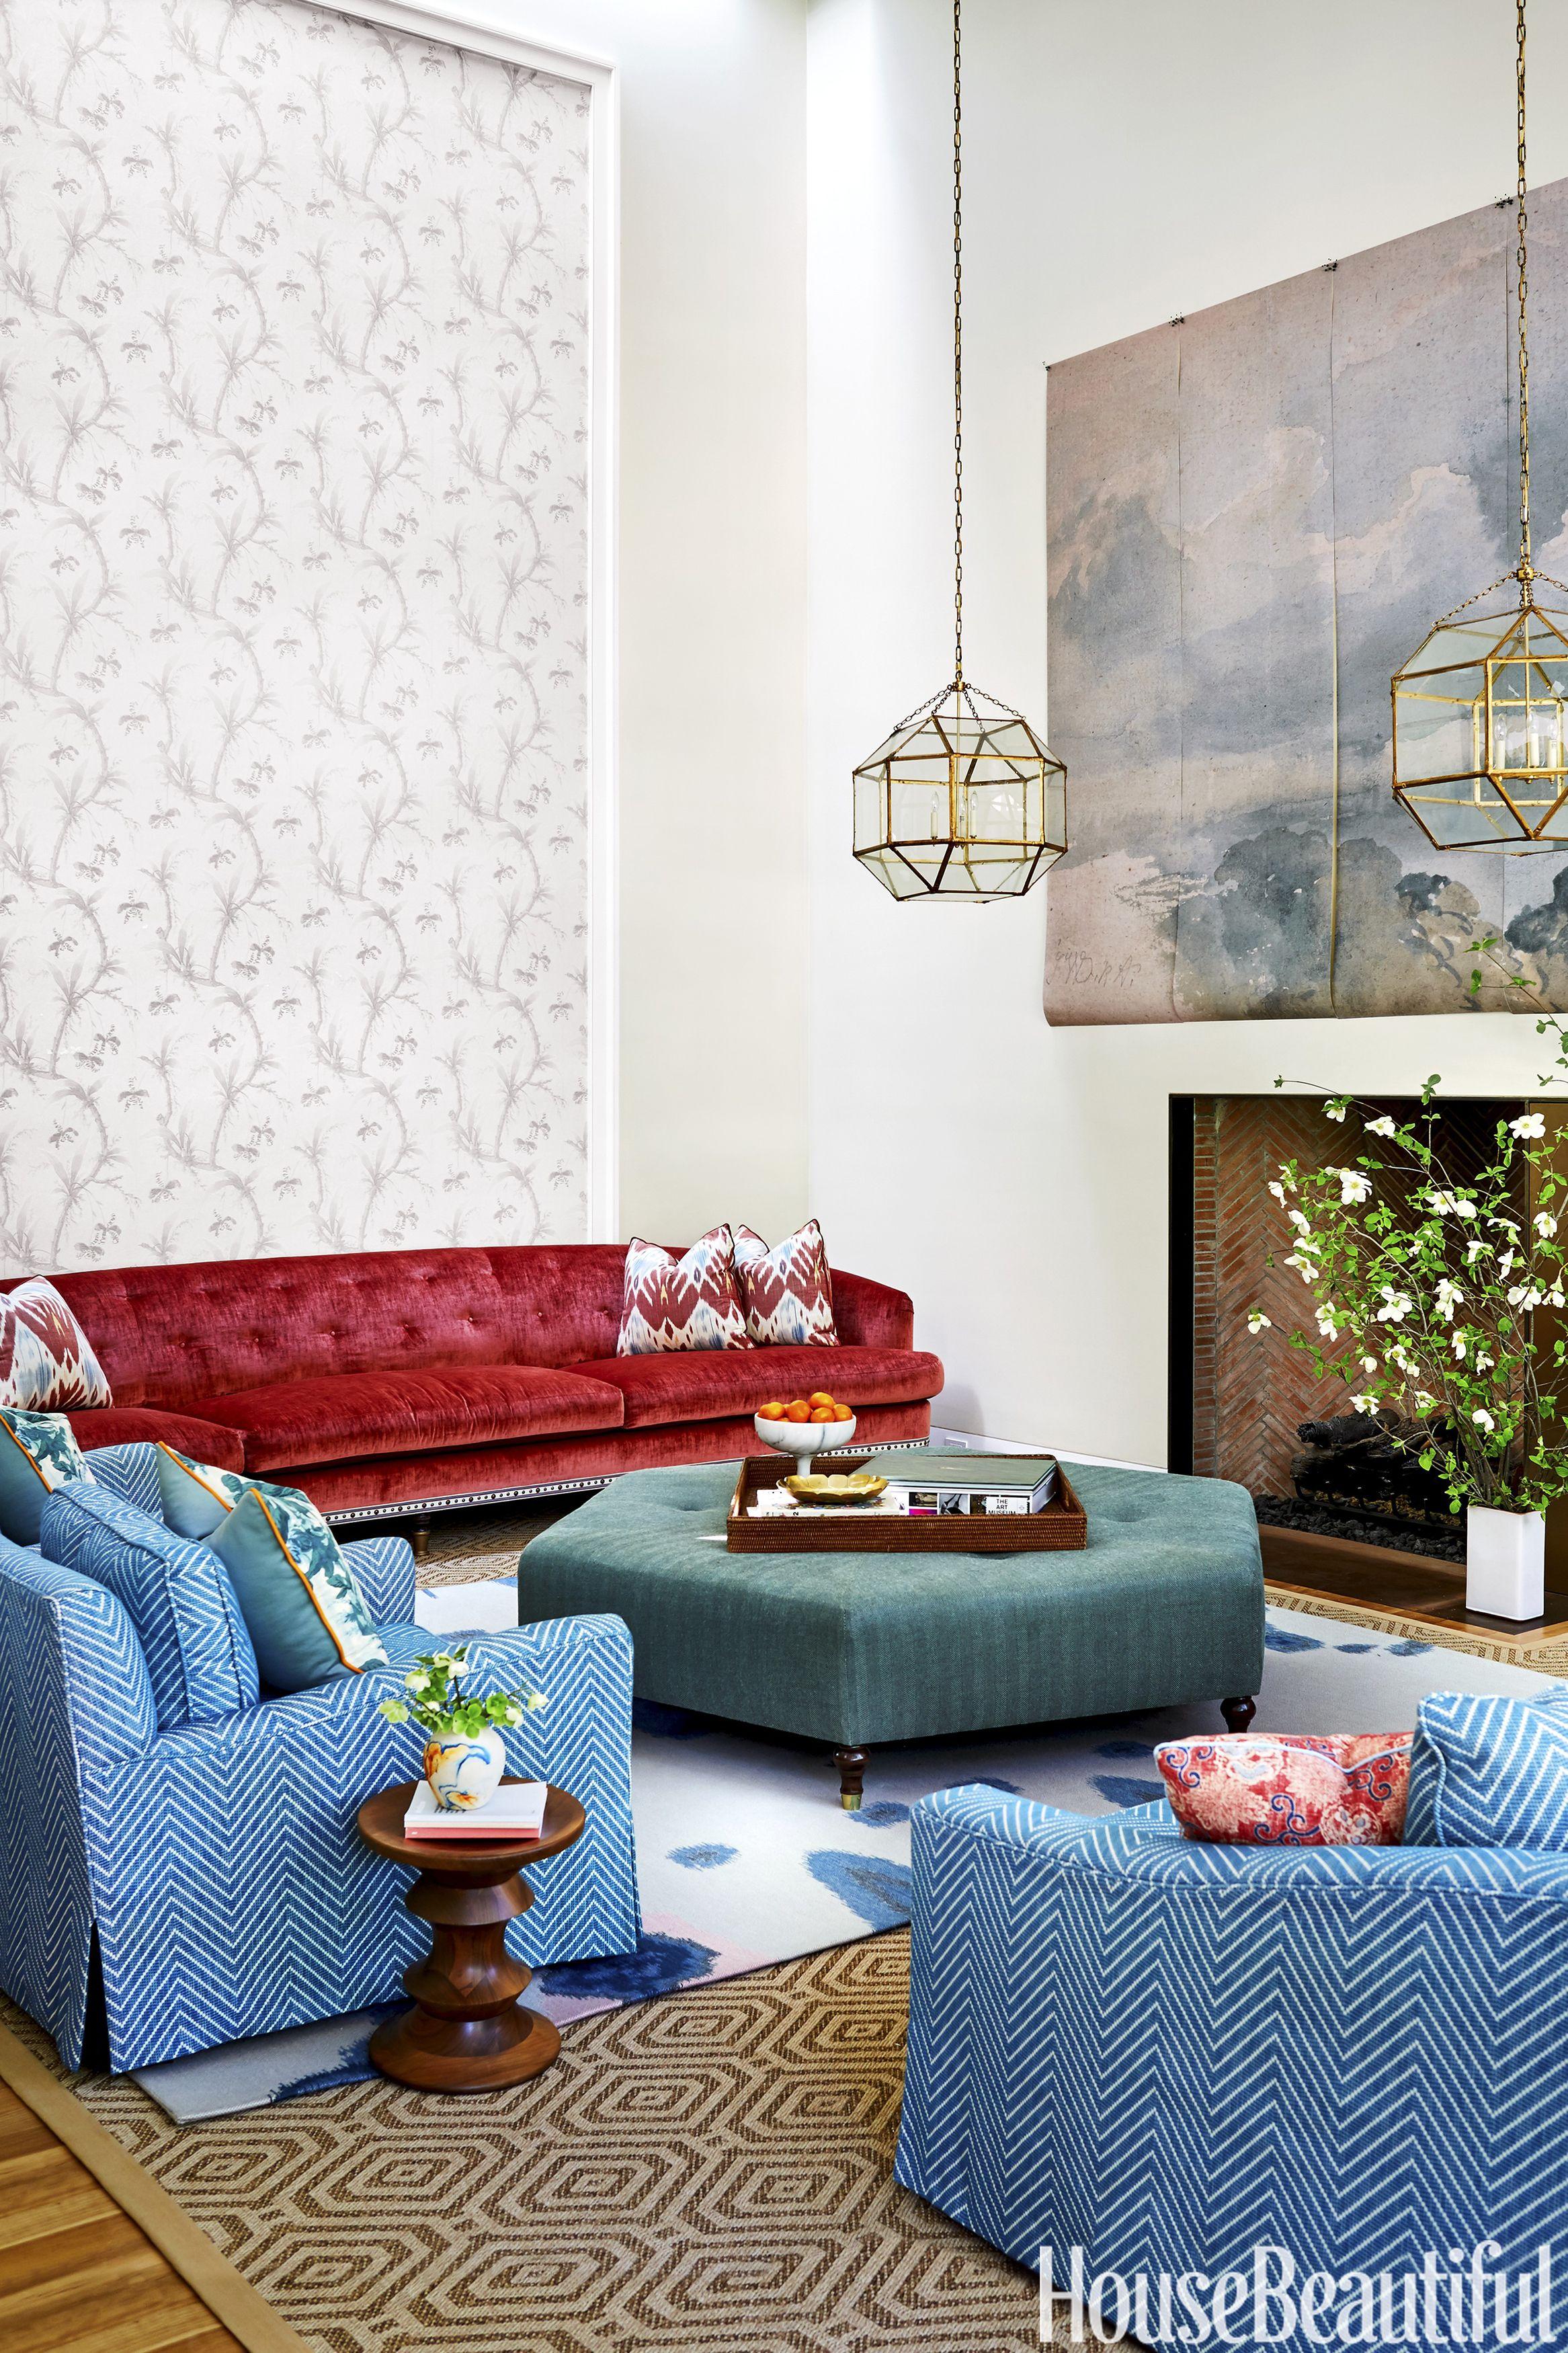 70 Best Living Room Decorating Ideas & Designs ... on Beautiful Room Decoration  id=43413